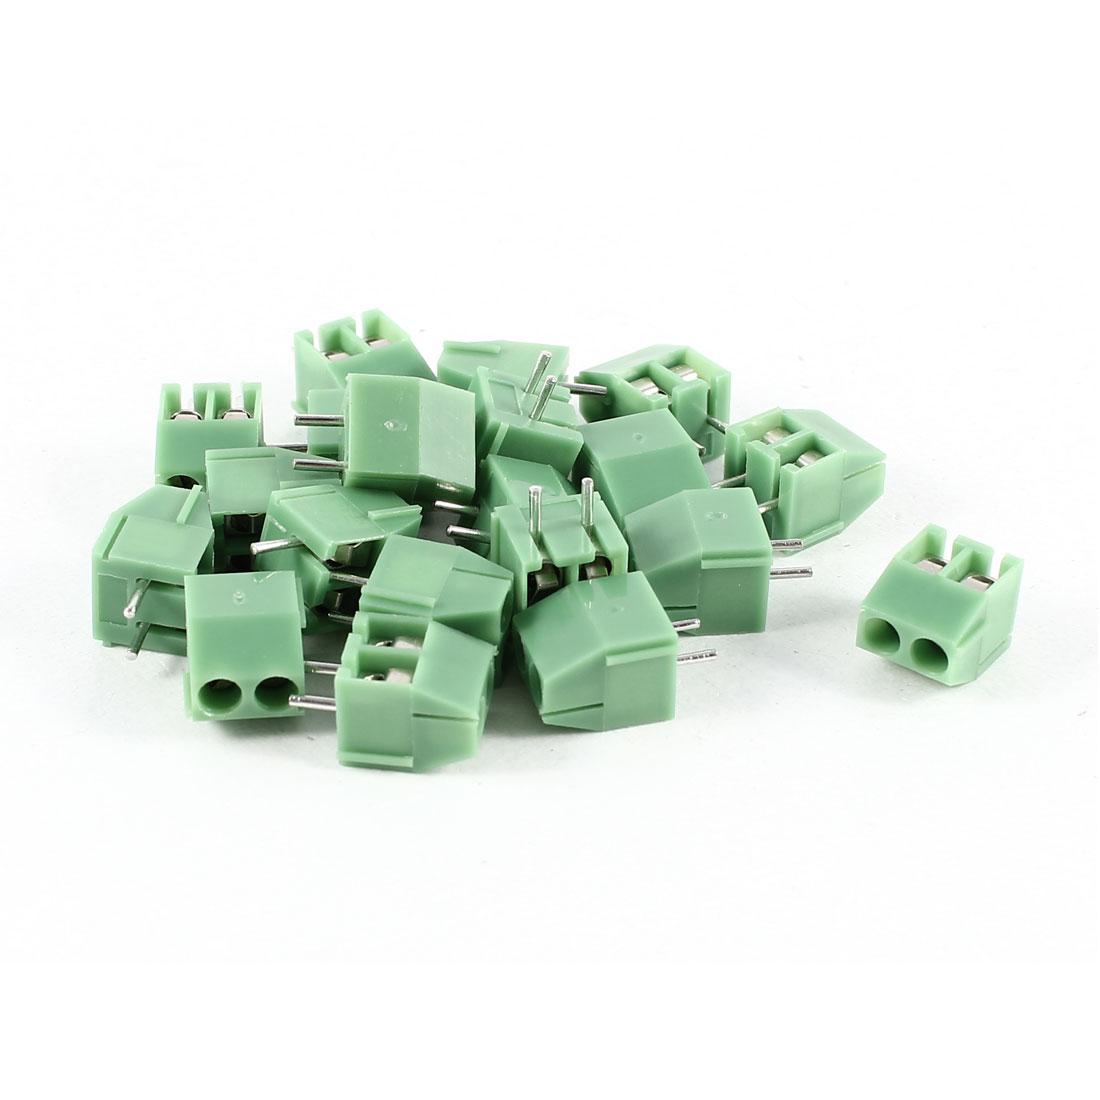 20 Pcs Green KF350-2P 2 Position 3.5mm Pitch PCB Mount Screw Terminal Block Connectors 300V 10A